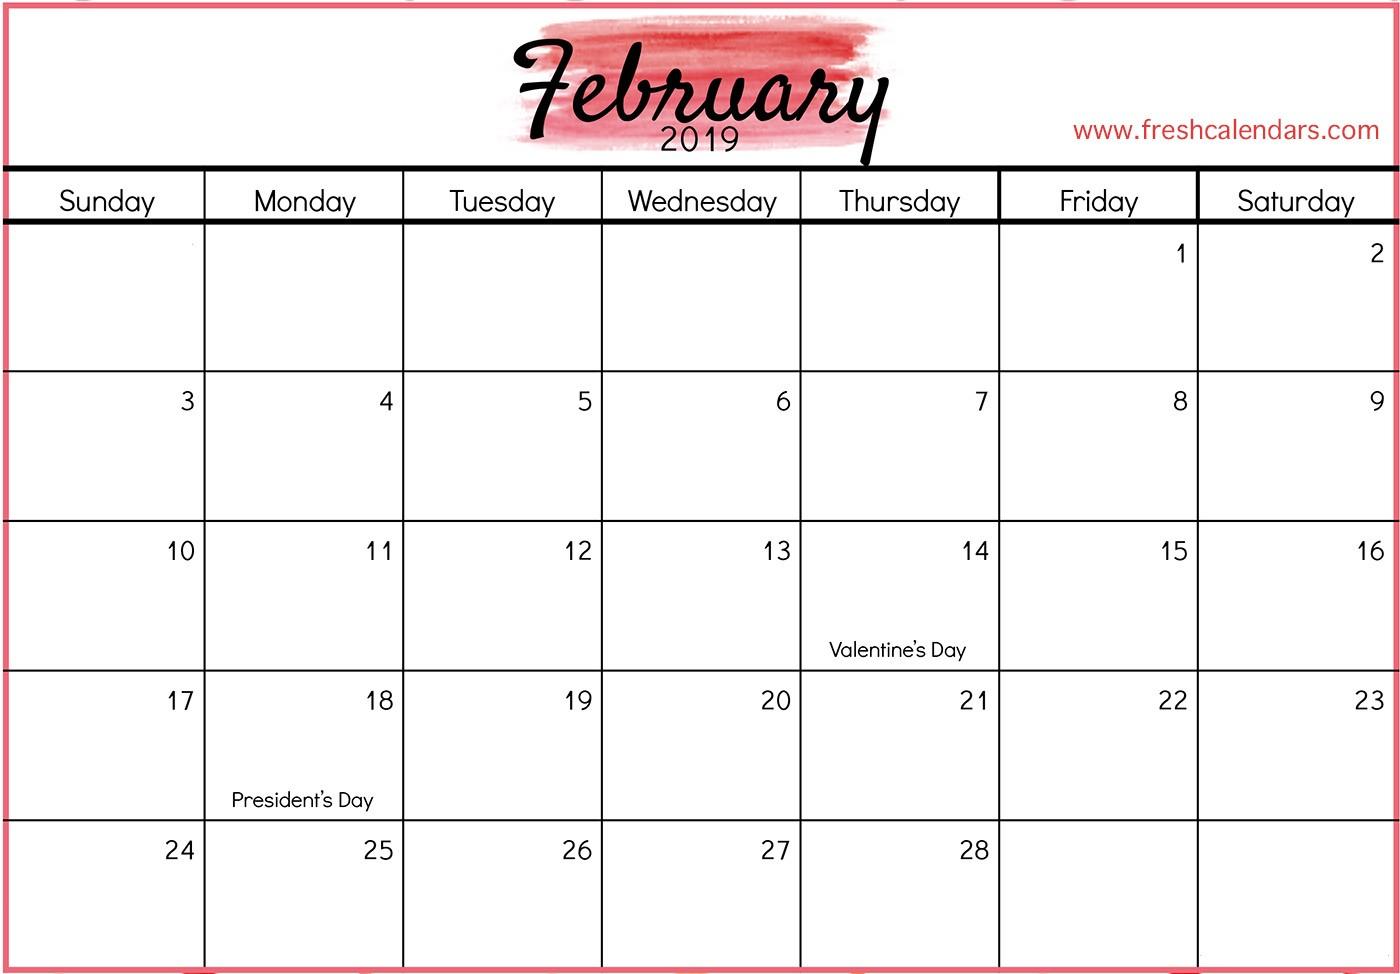 Free Printable February Calendars 2019 Blank February 2019 Calendar Printable Templates